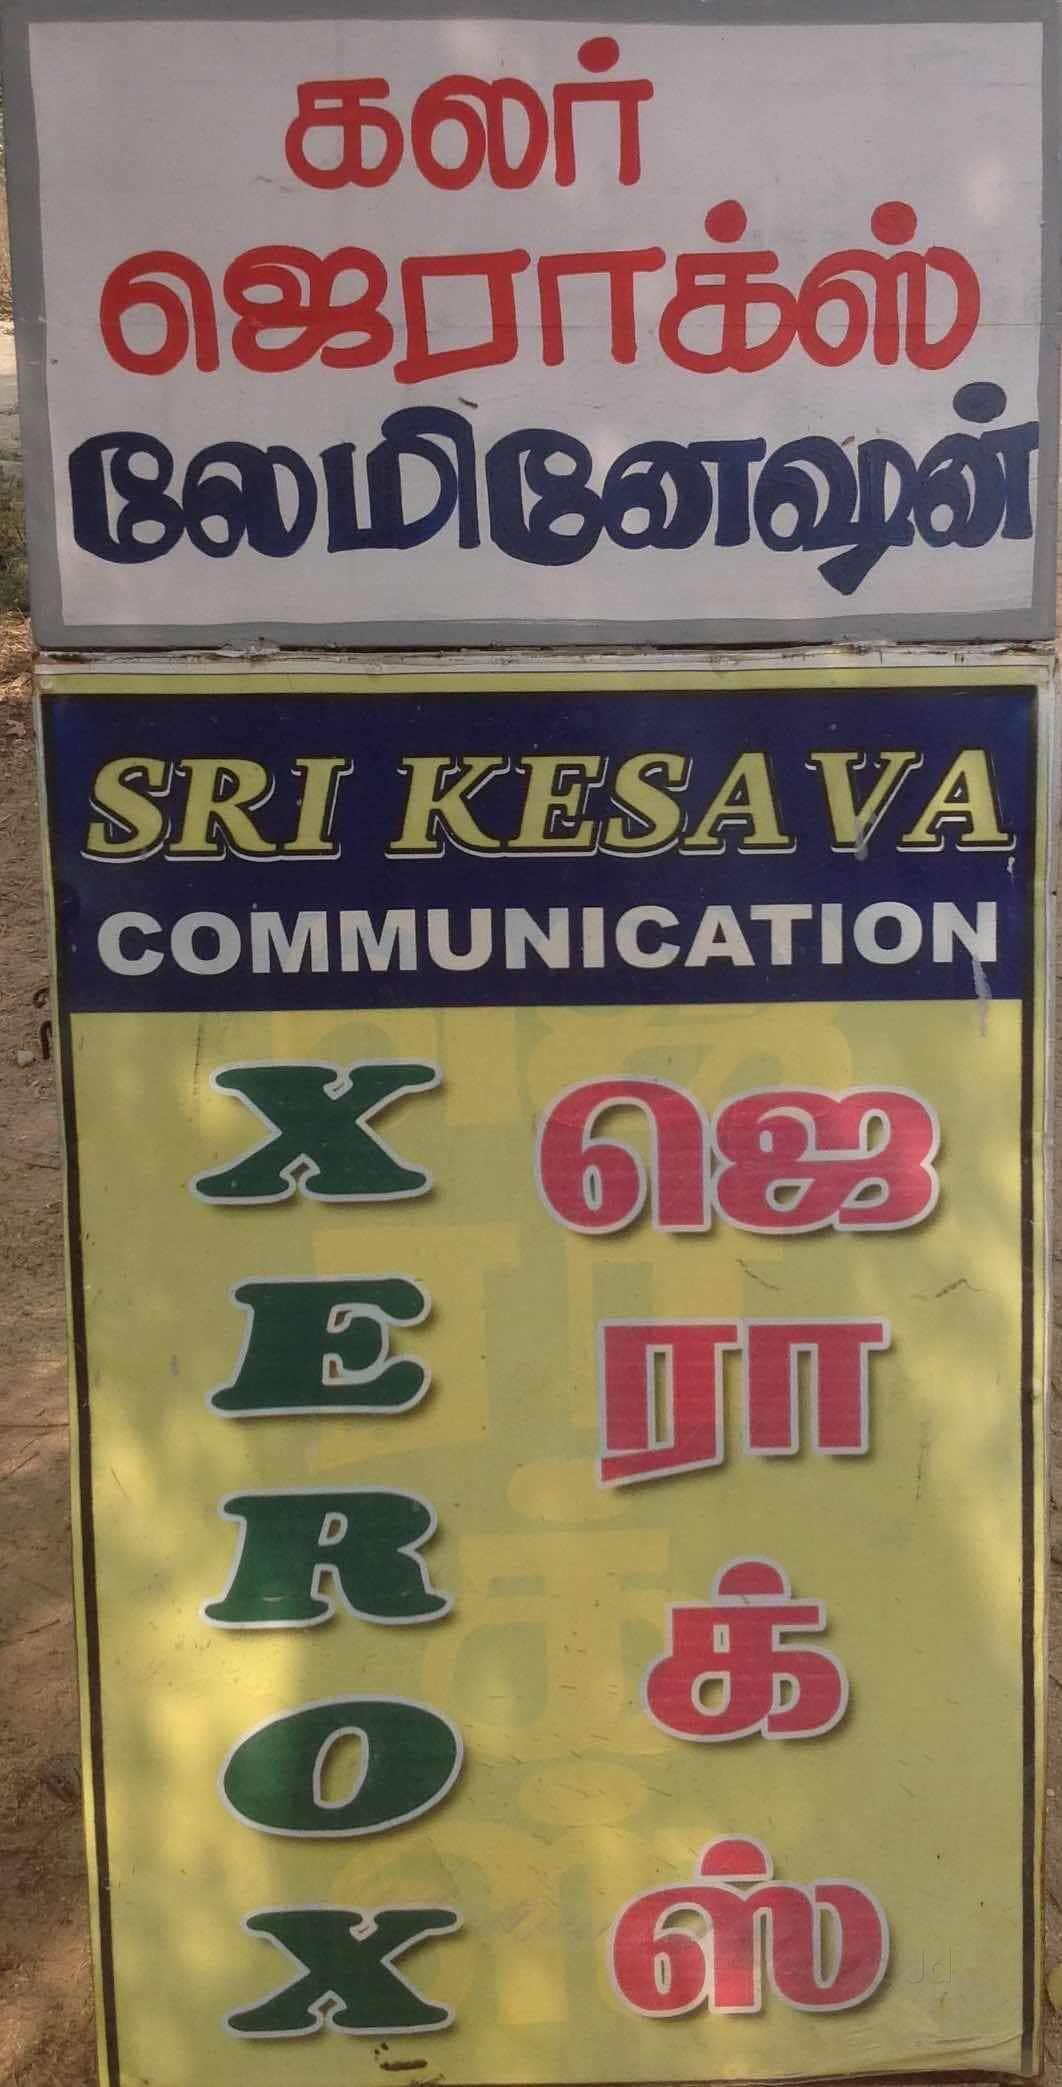 Top 50 Marriage Bureau in Walajapet, VELLORE - Best Tamil